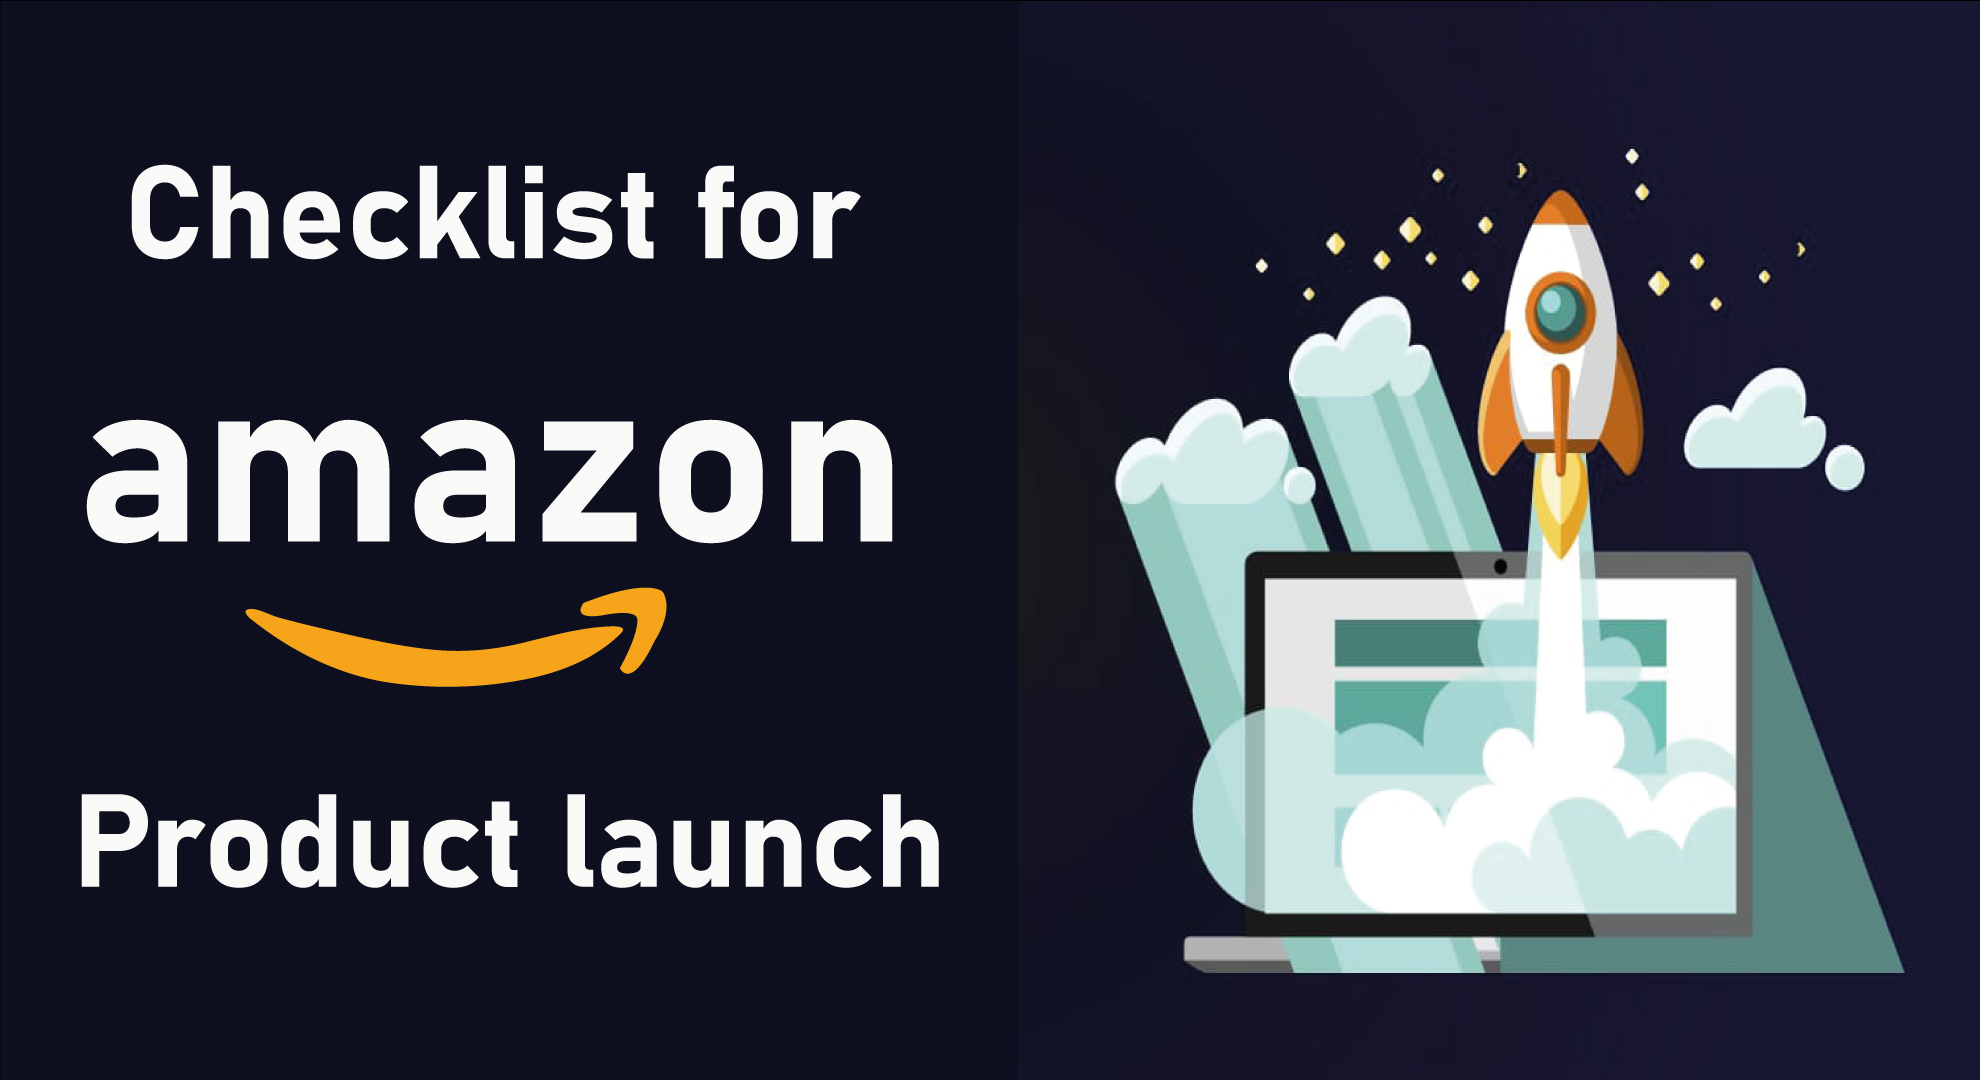 Checklist-for-Amazon-Product-Launchhhhh